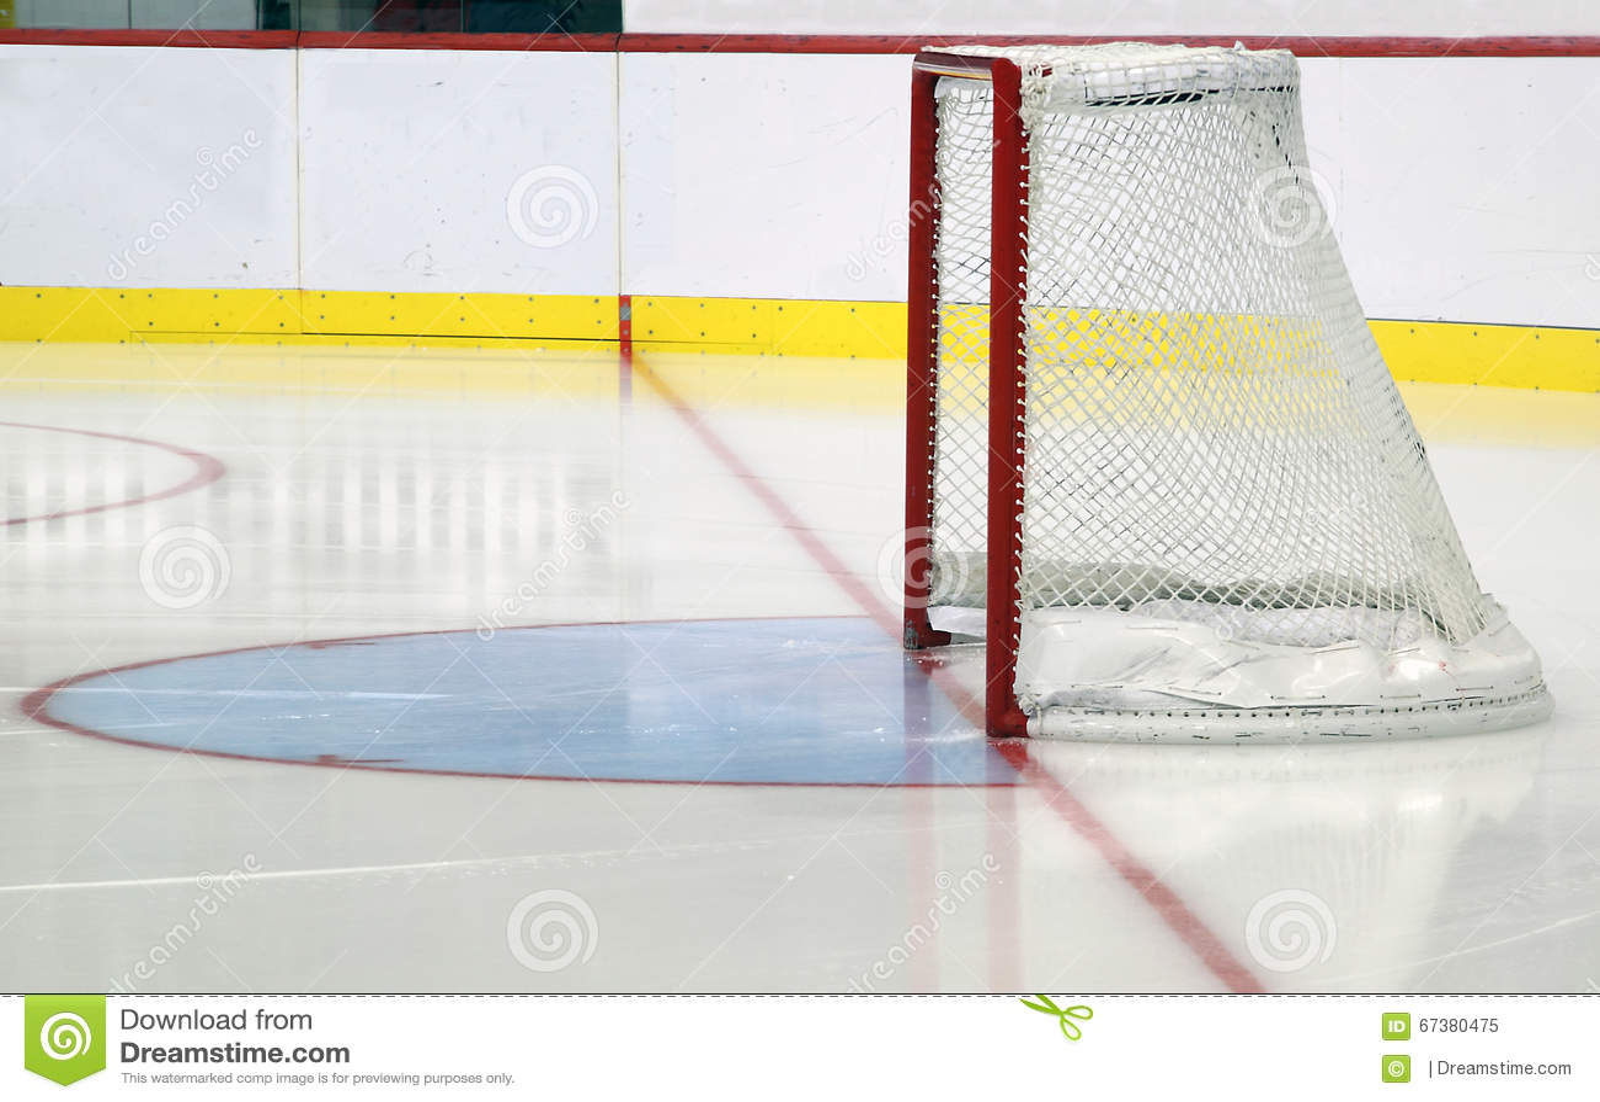 Netto ijshockey